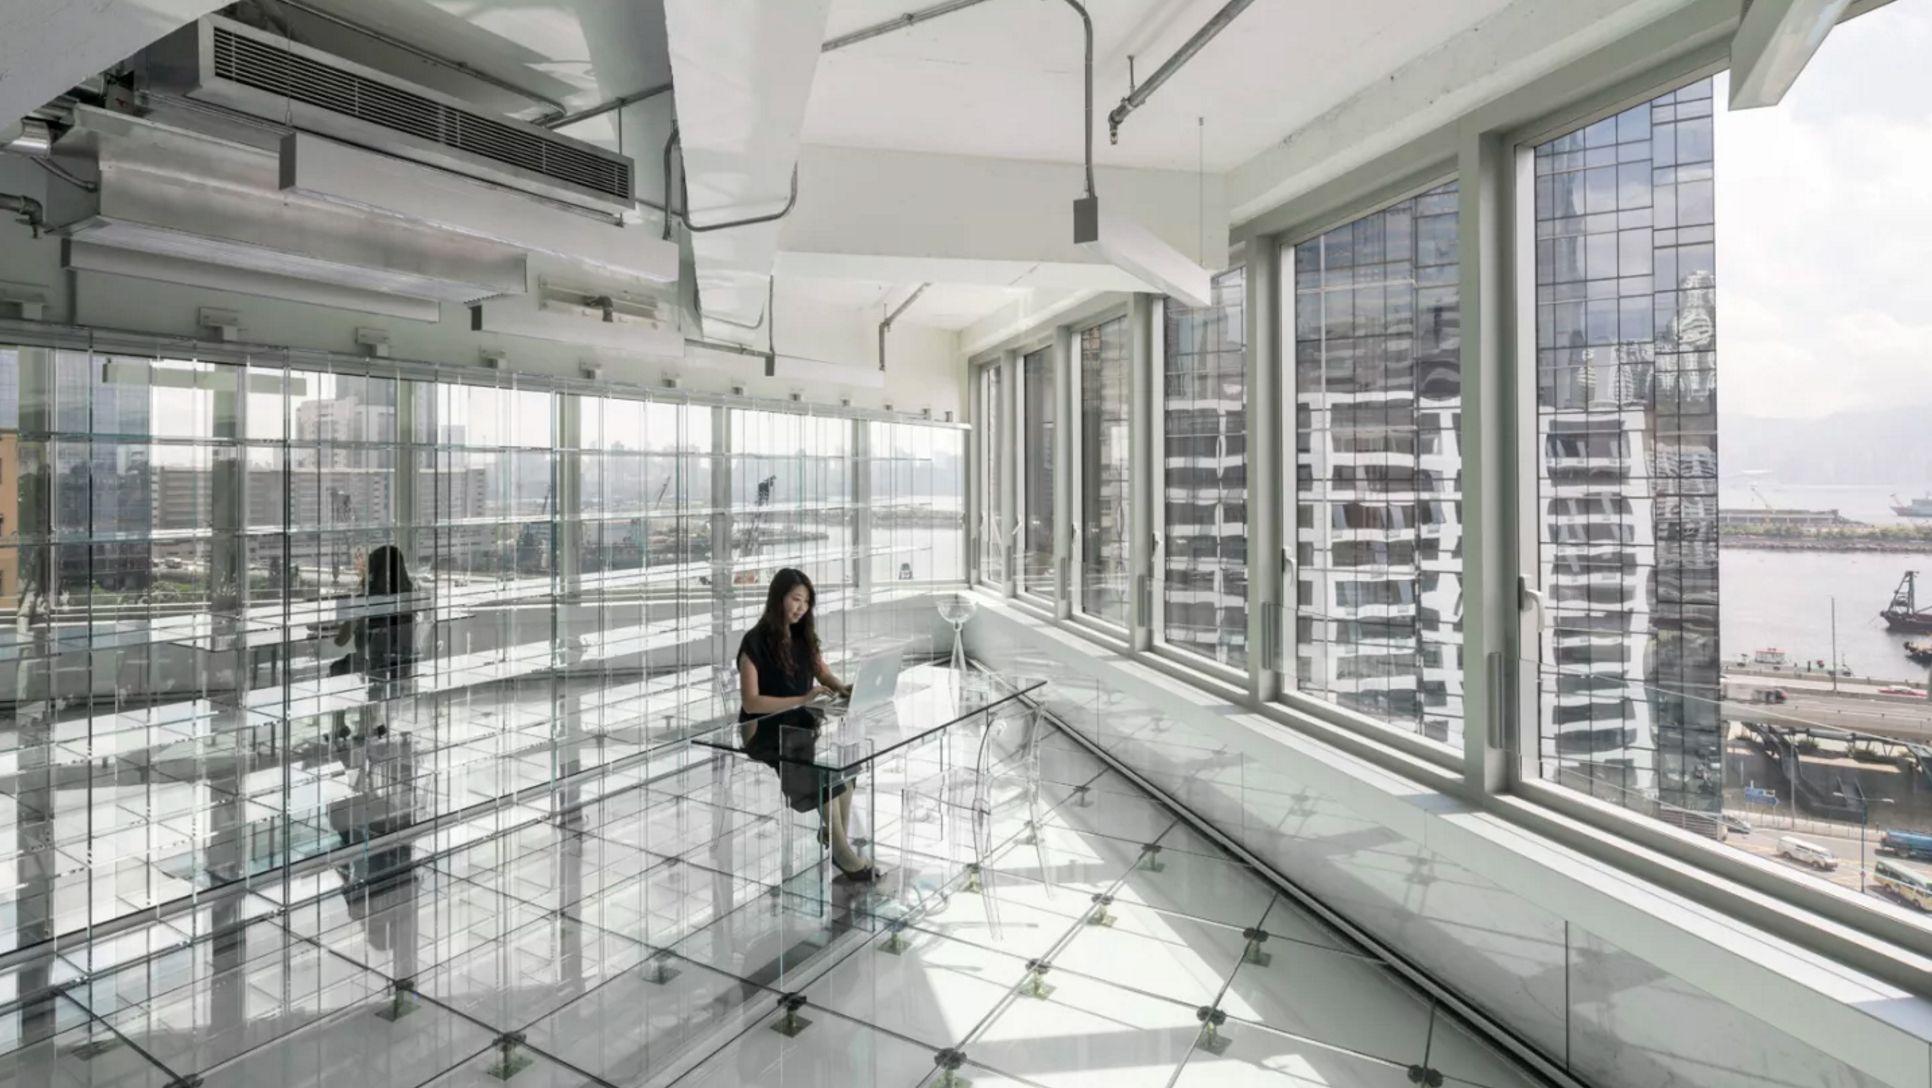 Architecture in #HK - #Workspace by MVRDV, ph Ossip van Duivenbode ...